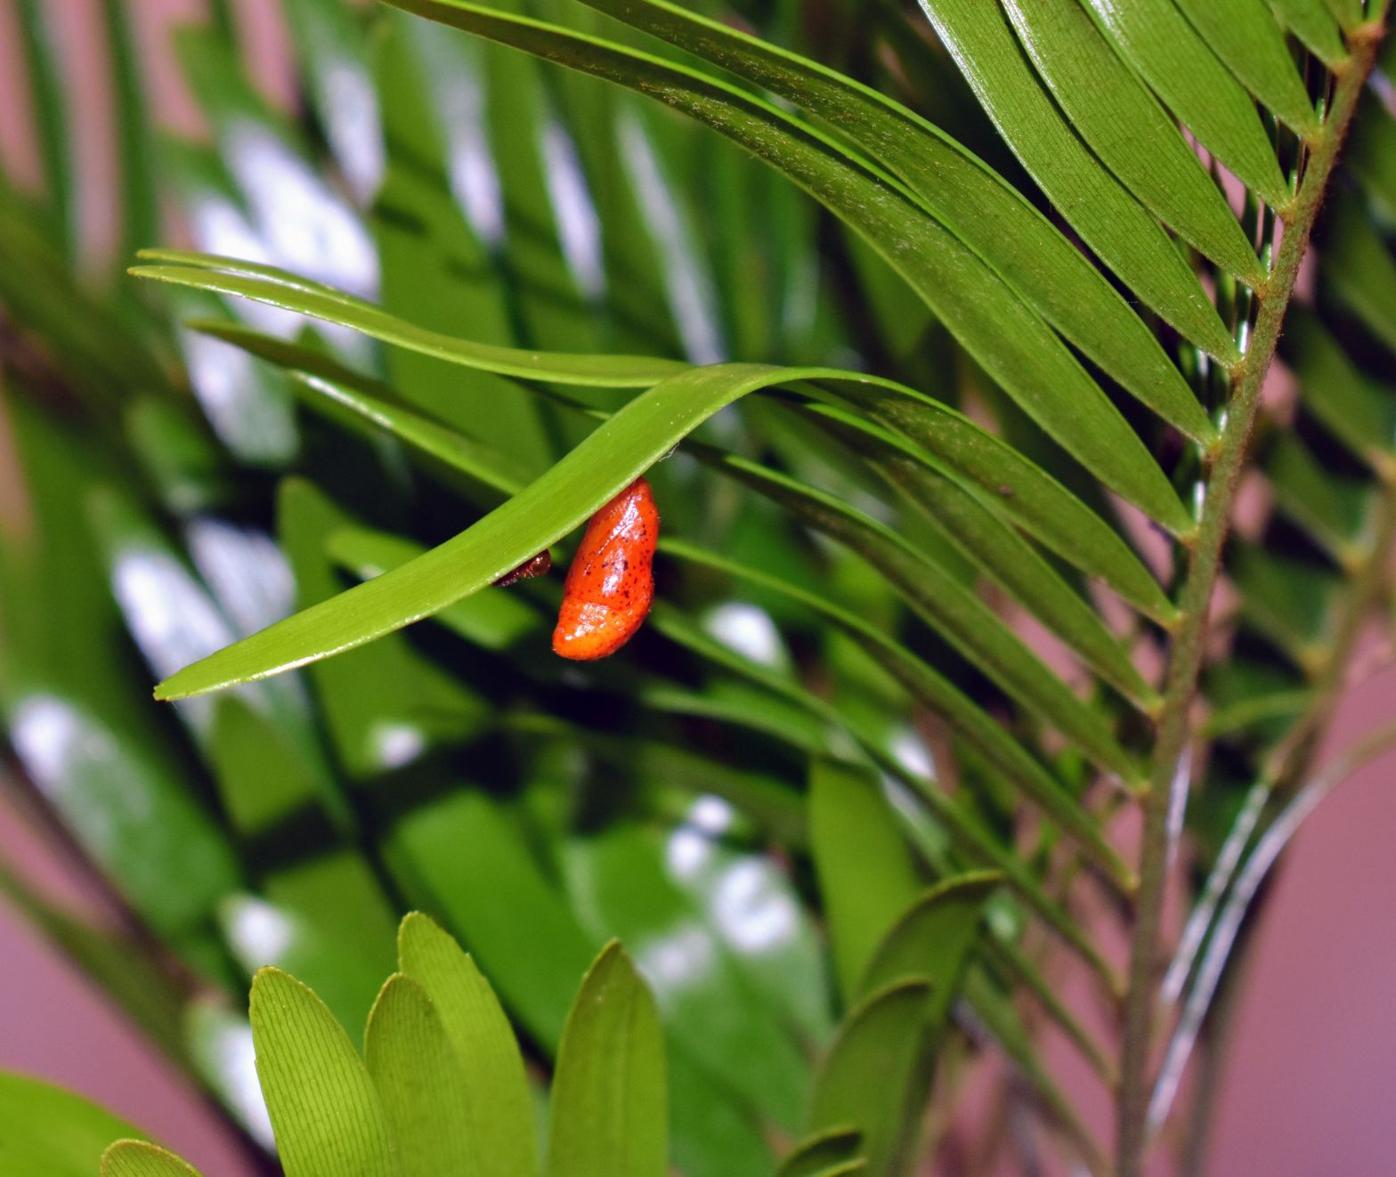 Atala chrysalis